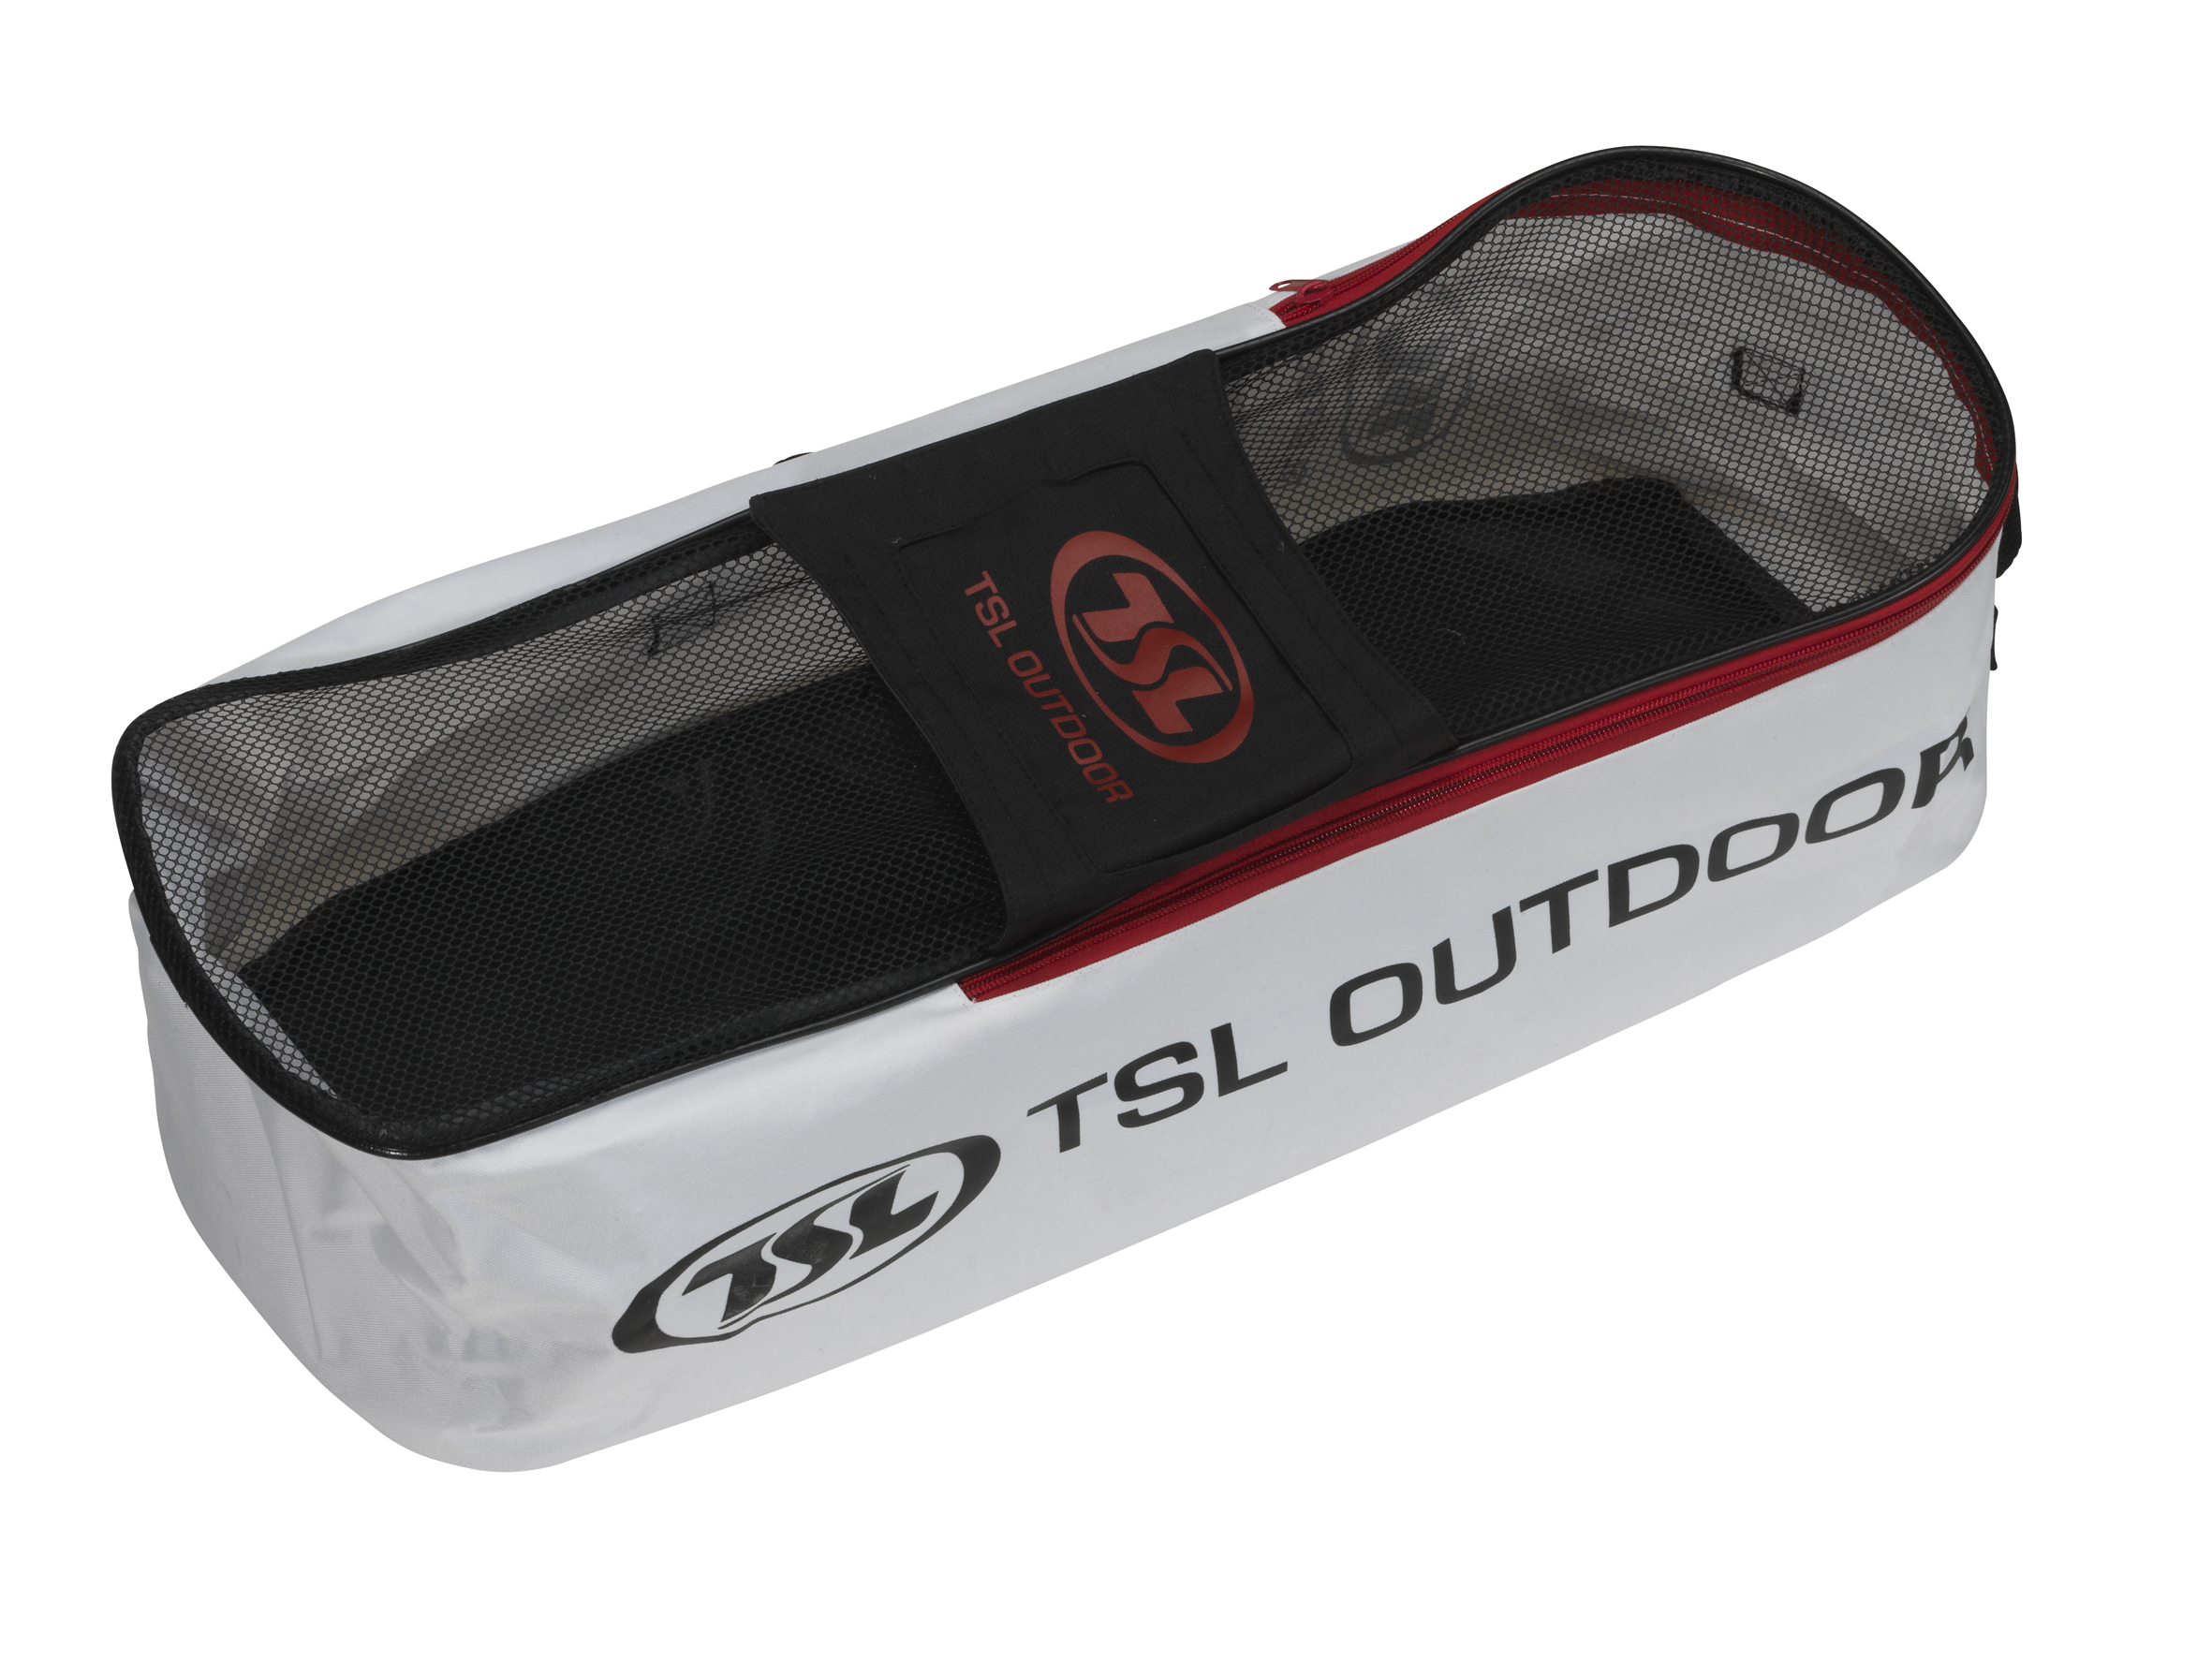 TSL Outdoor - Snowshoes bag